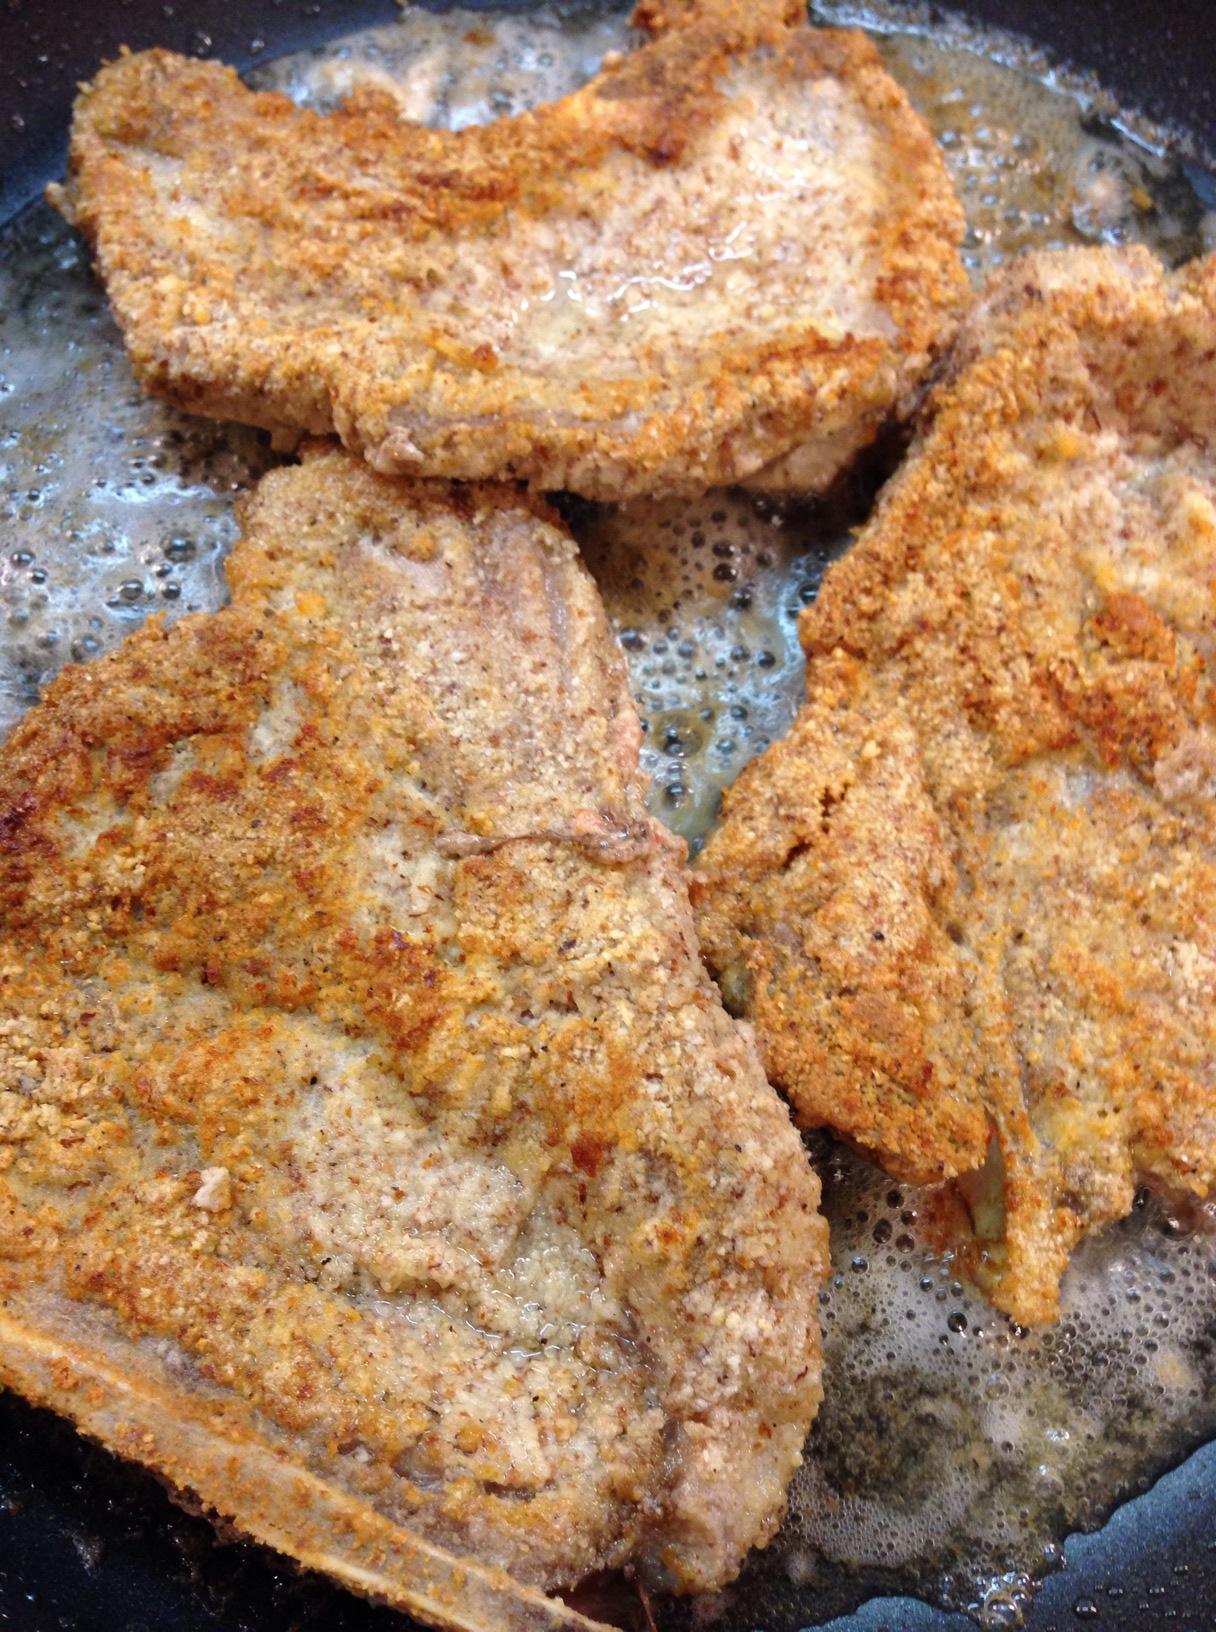 Fried In Coconut Oil